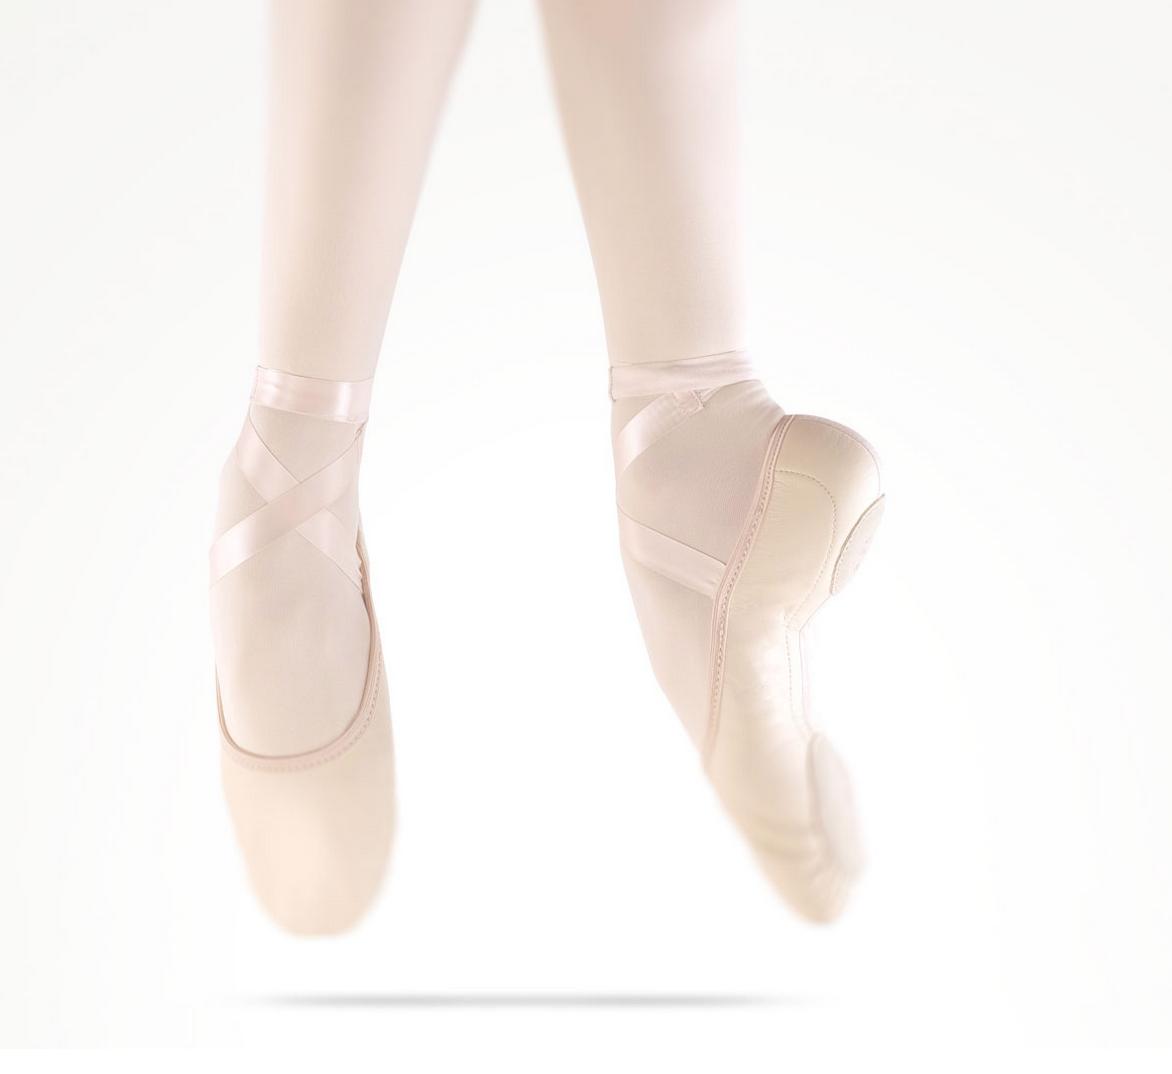 Tutu Sewing Ballet Ribbons or Elastics